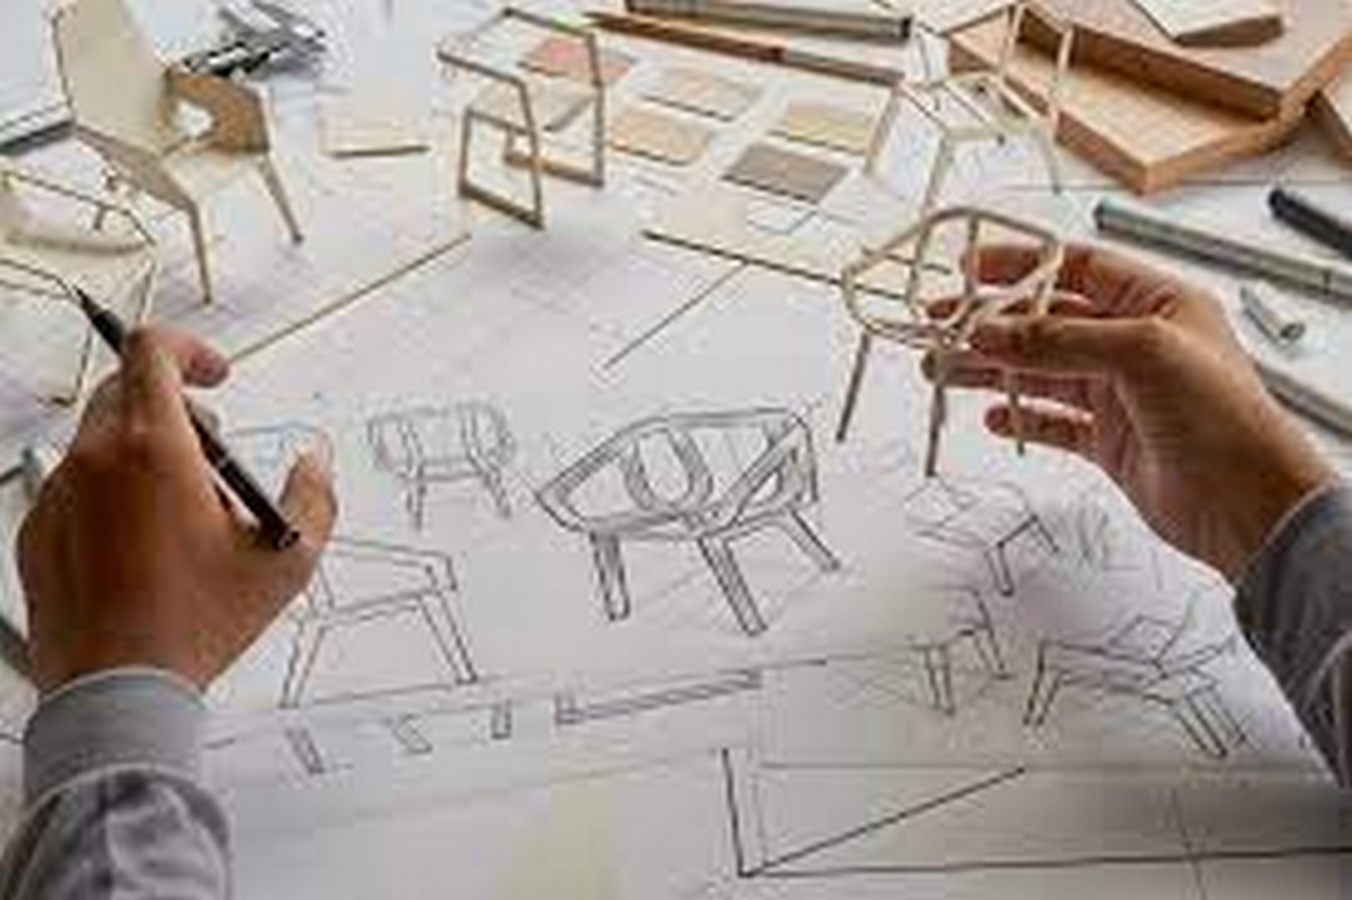 Career Guide: Furniture Design Sheet1